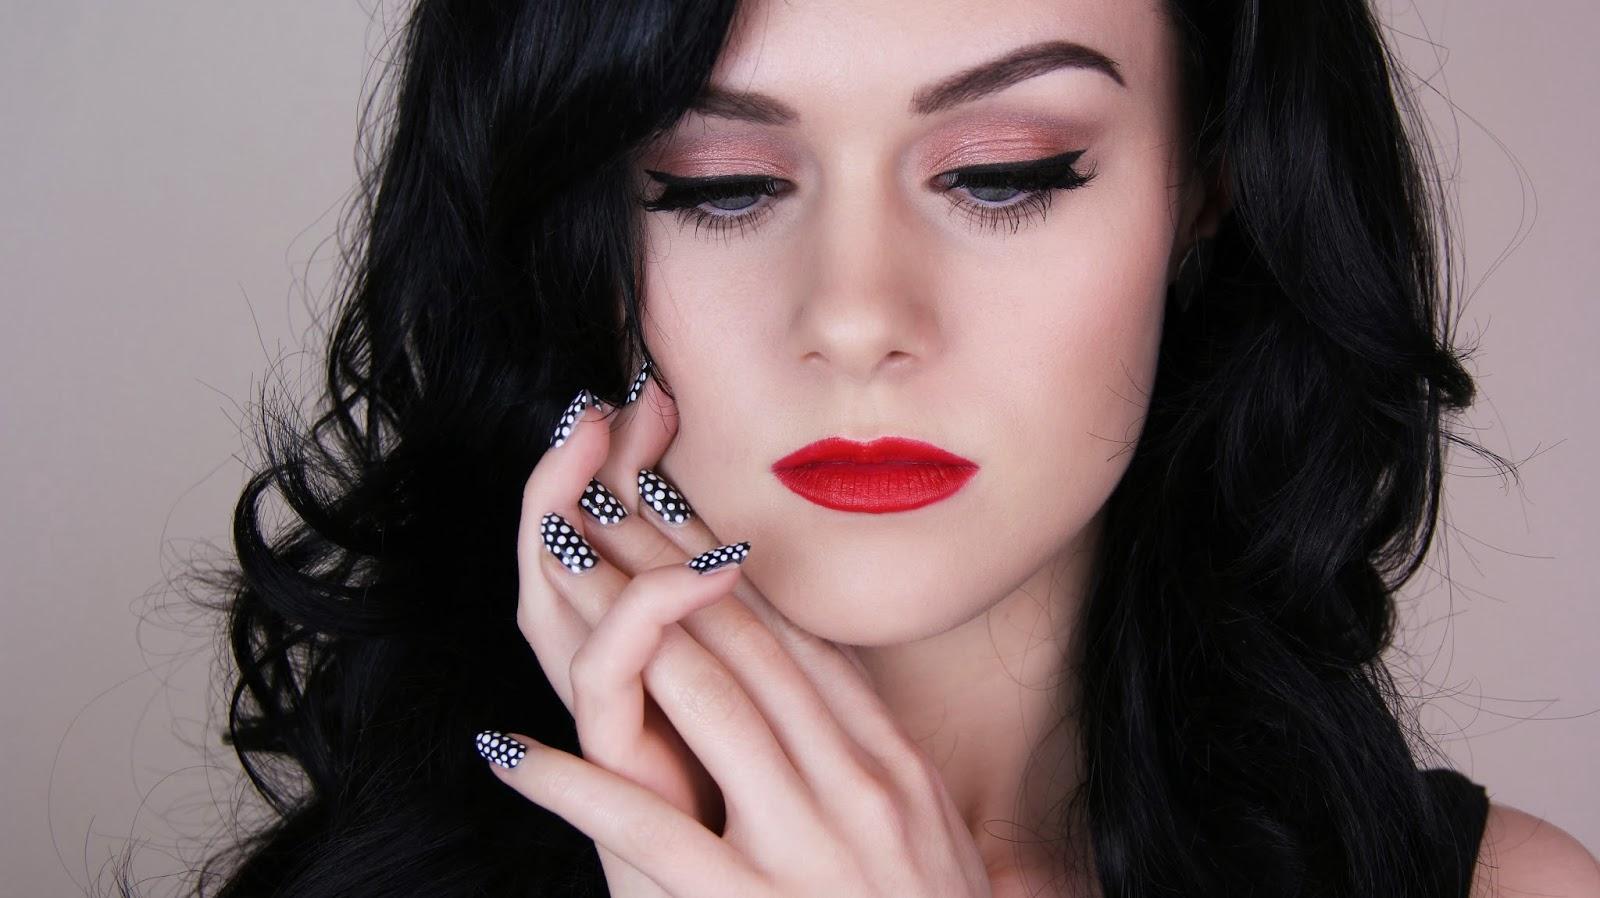 Emma Pickles: Katy Perry Inspired Holiday Look | Makeup, Hair & Nails